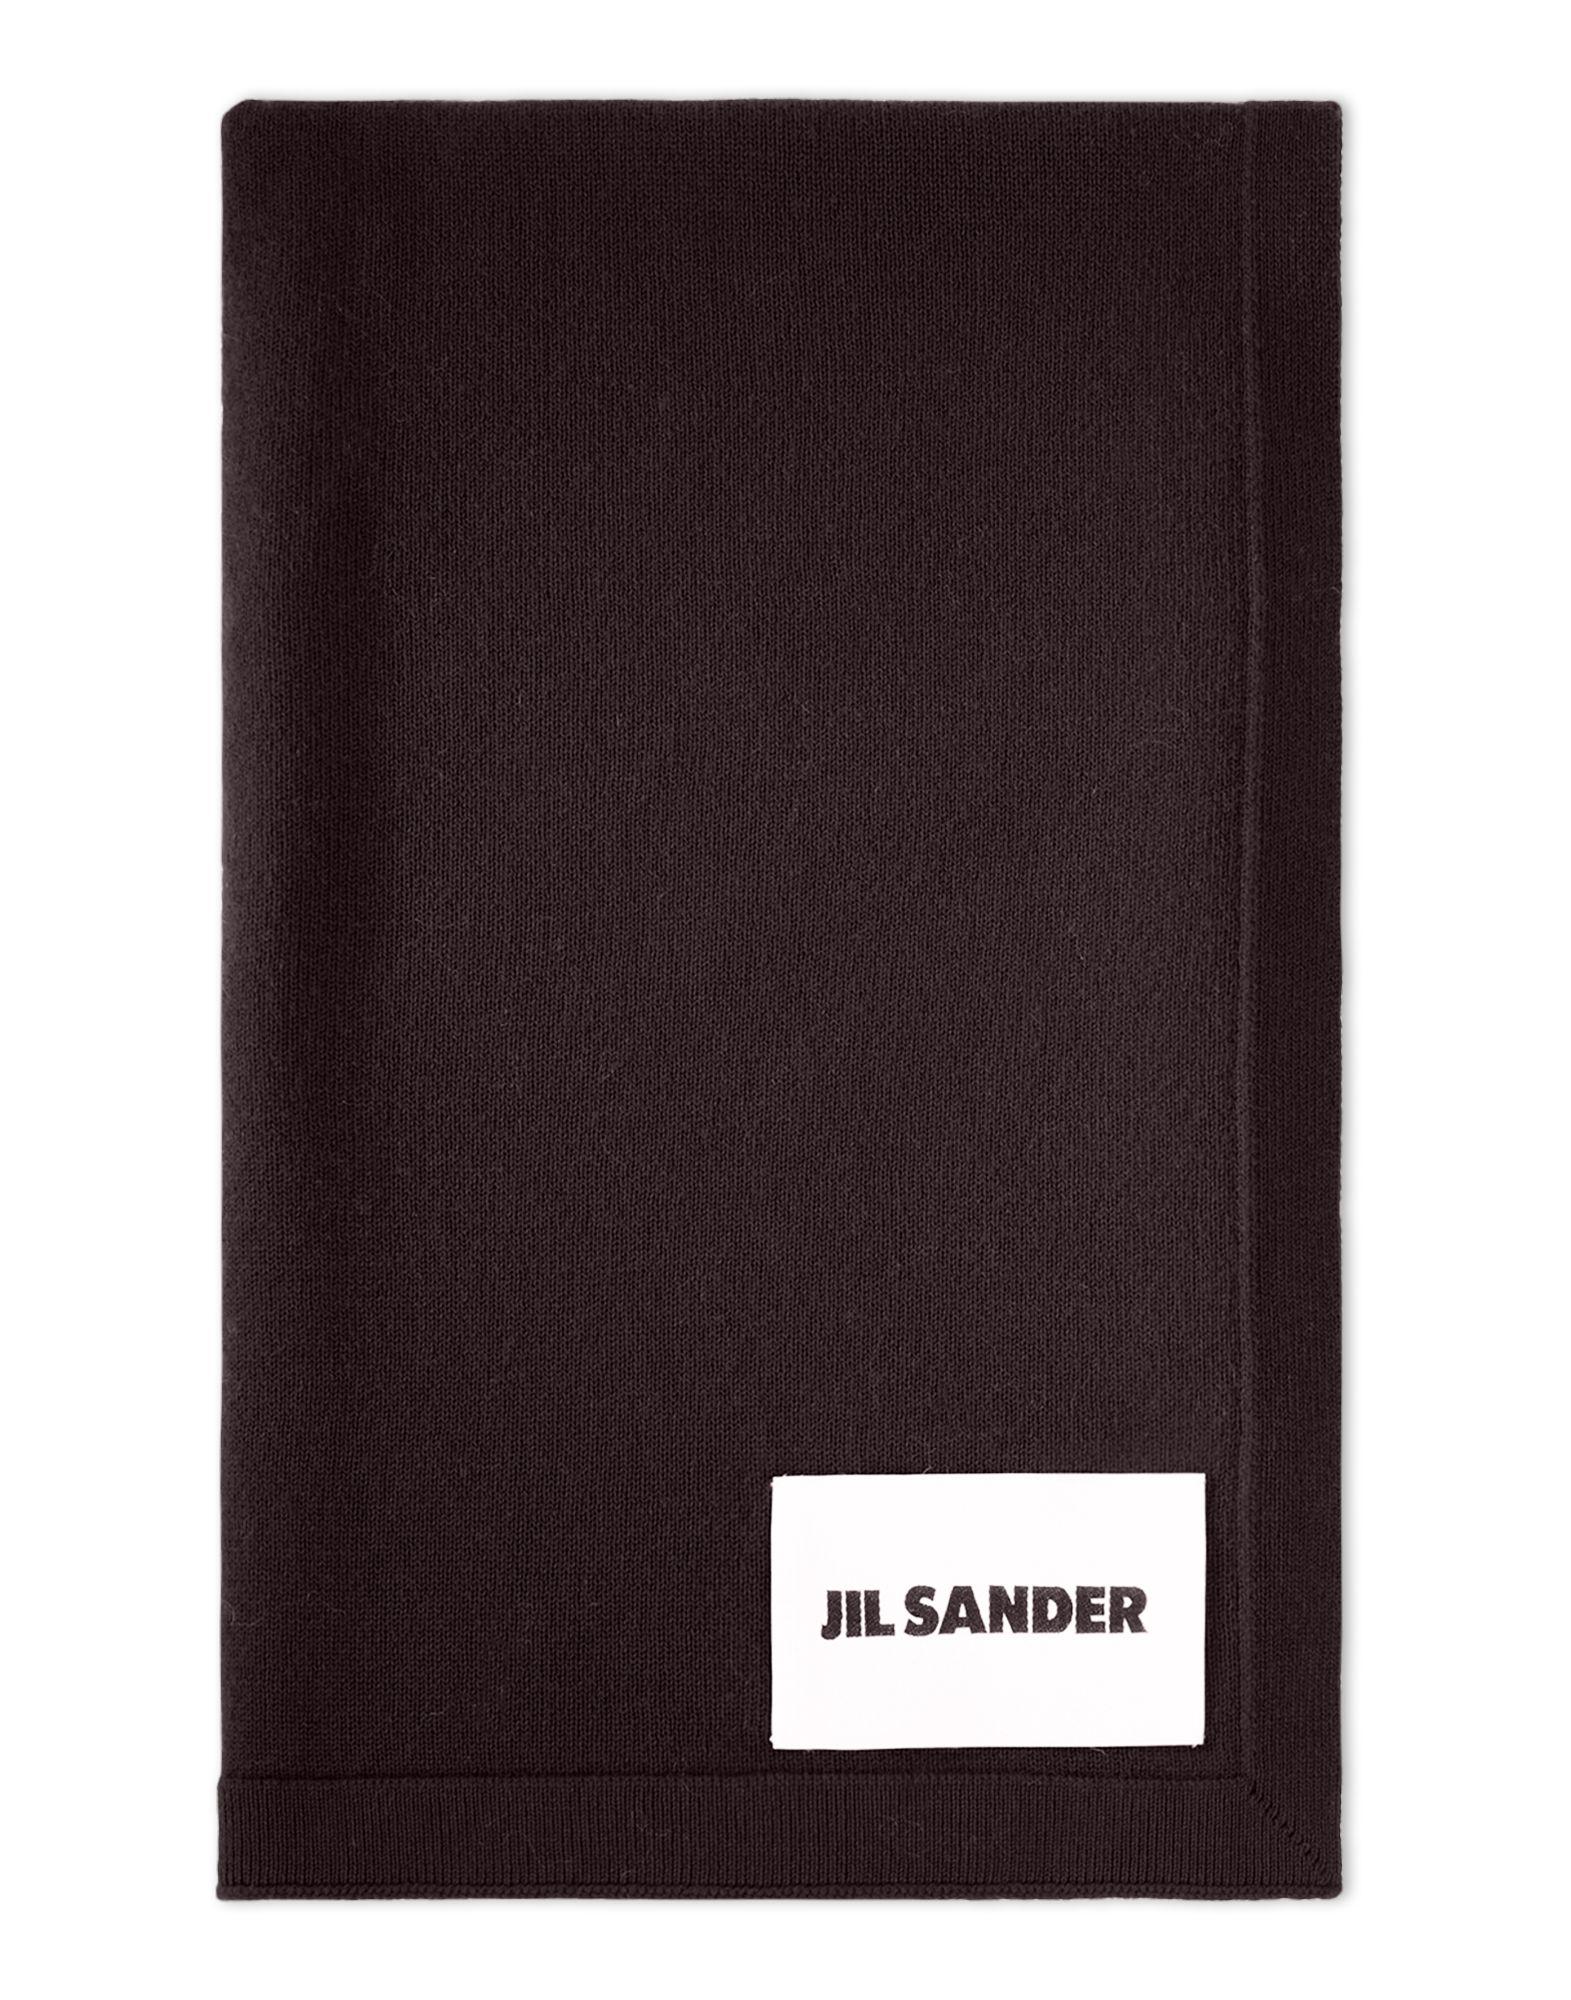 Scarf - JIL SANDER Online Store